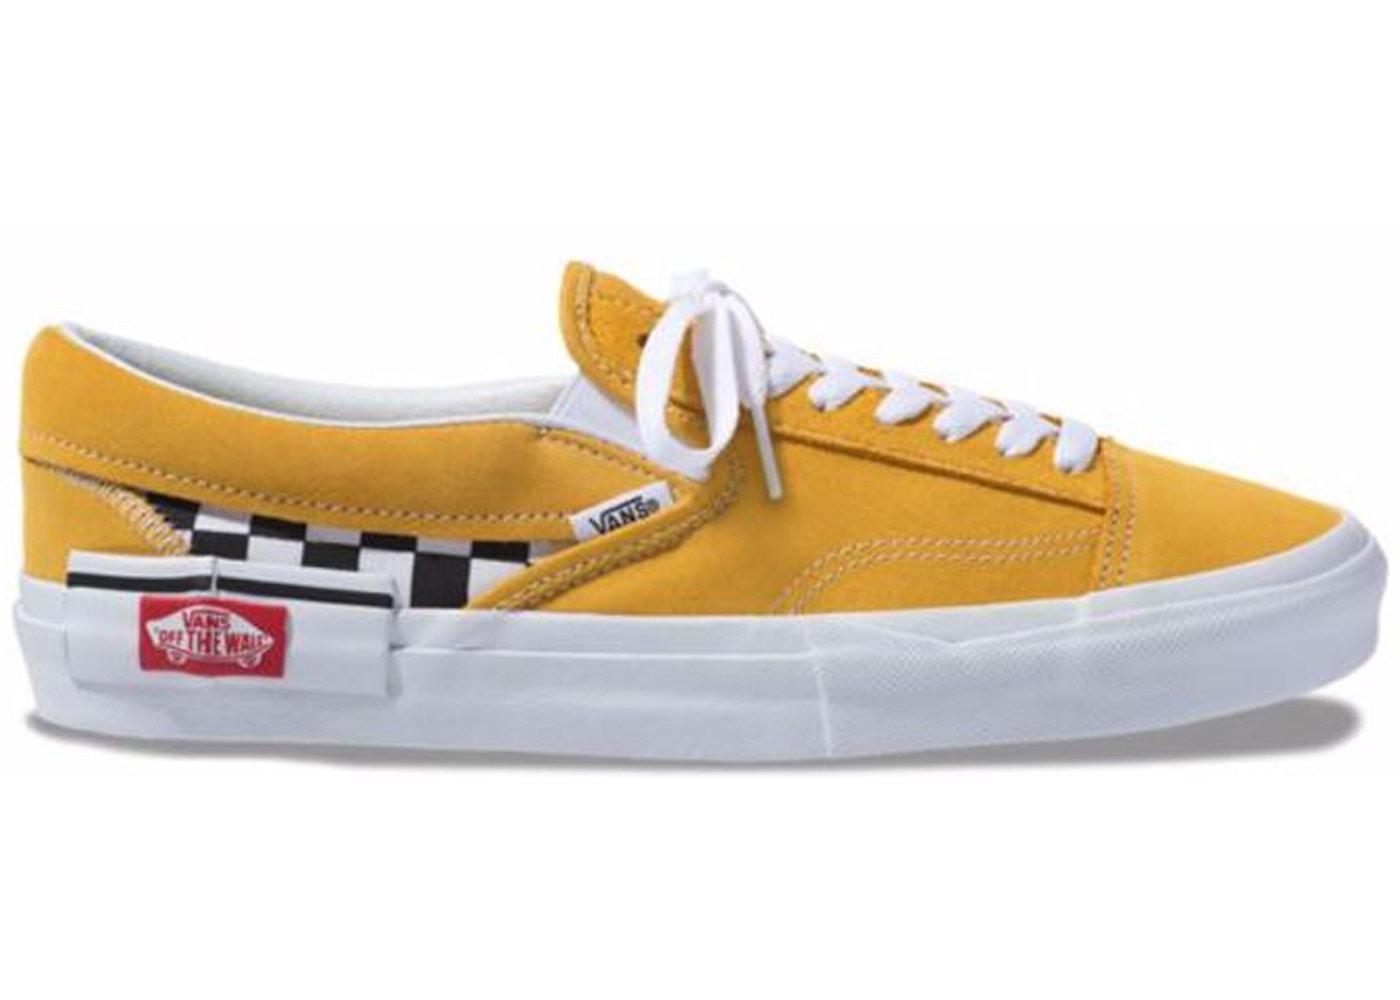 0657d4869840 Vans Slip-On Cap Checkerboard Yolk Yellow